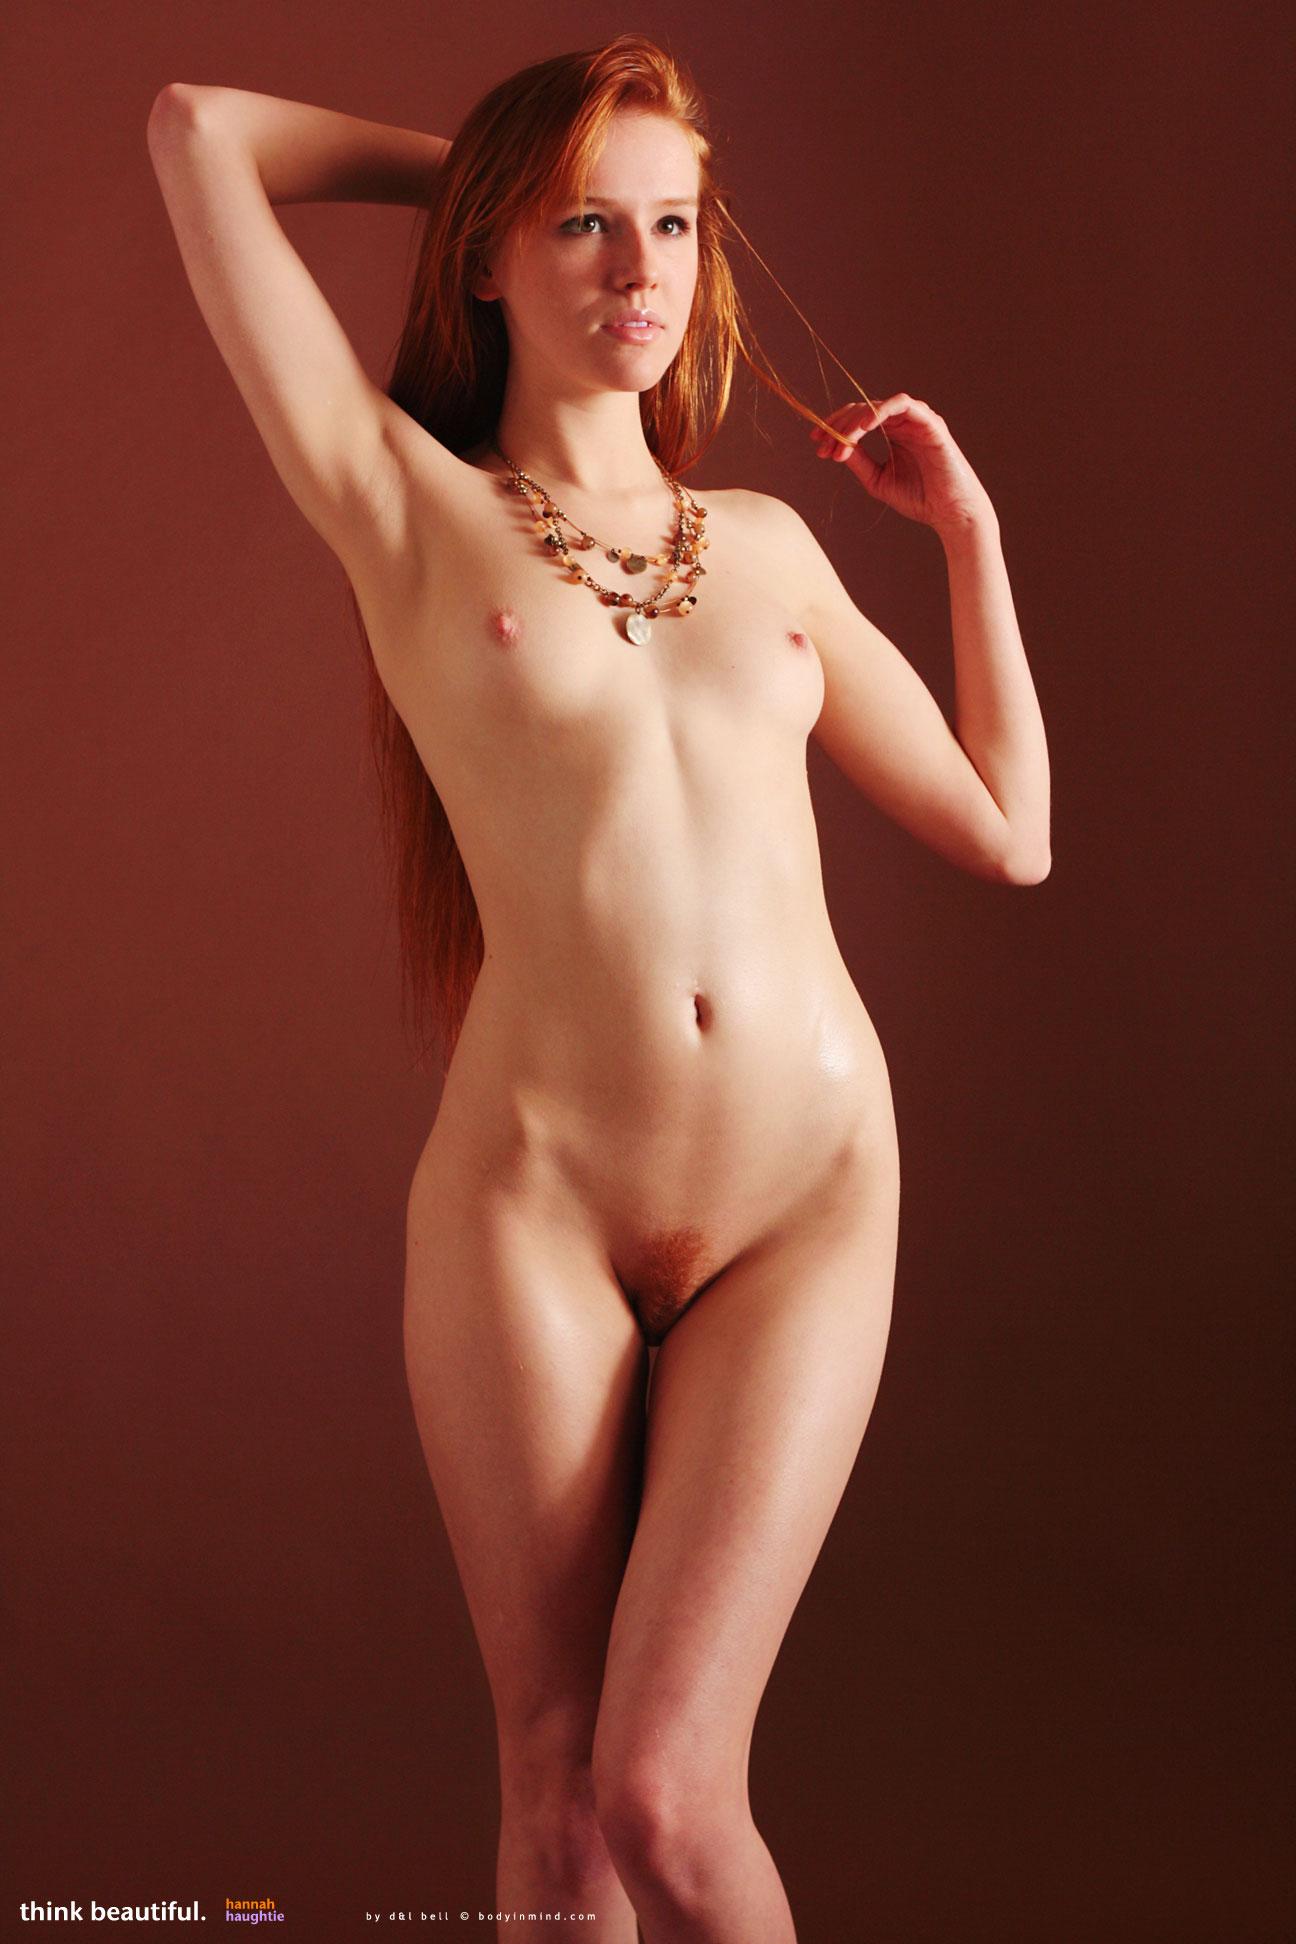 hannah-long-hair-redhead-naked-young-bodyinmind-07